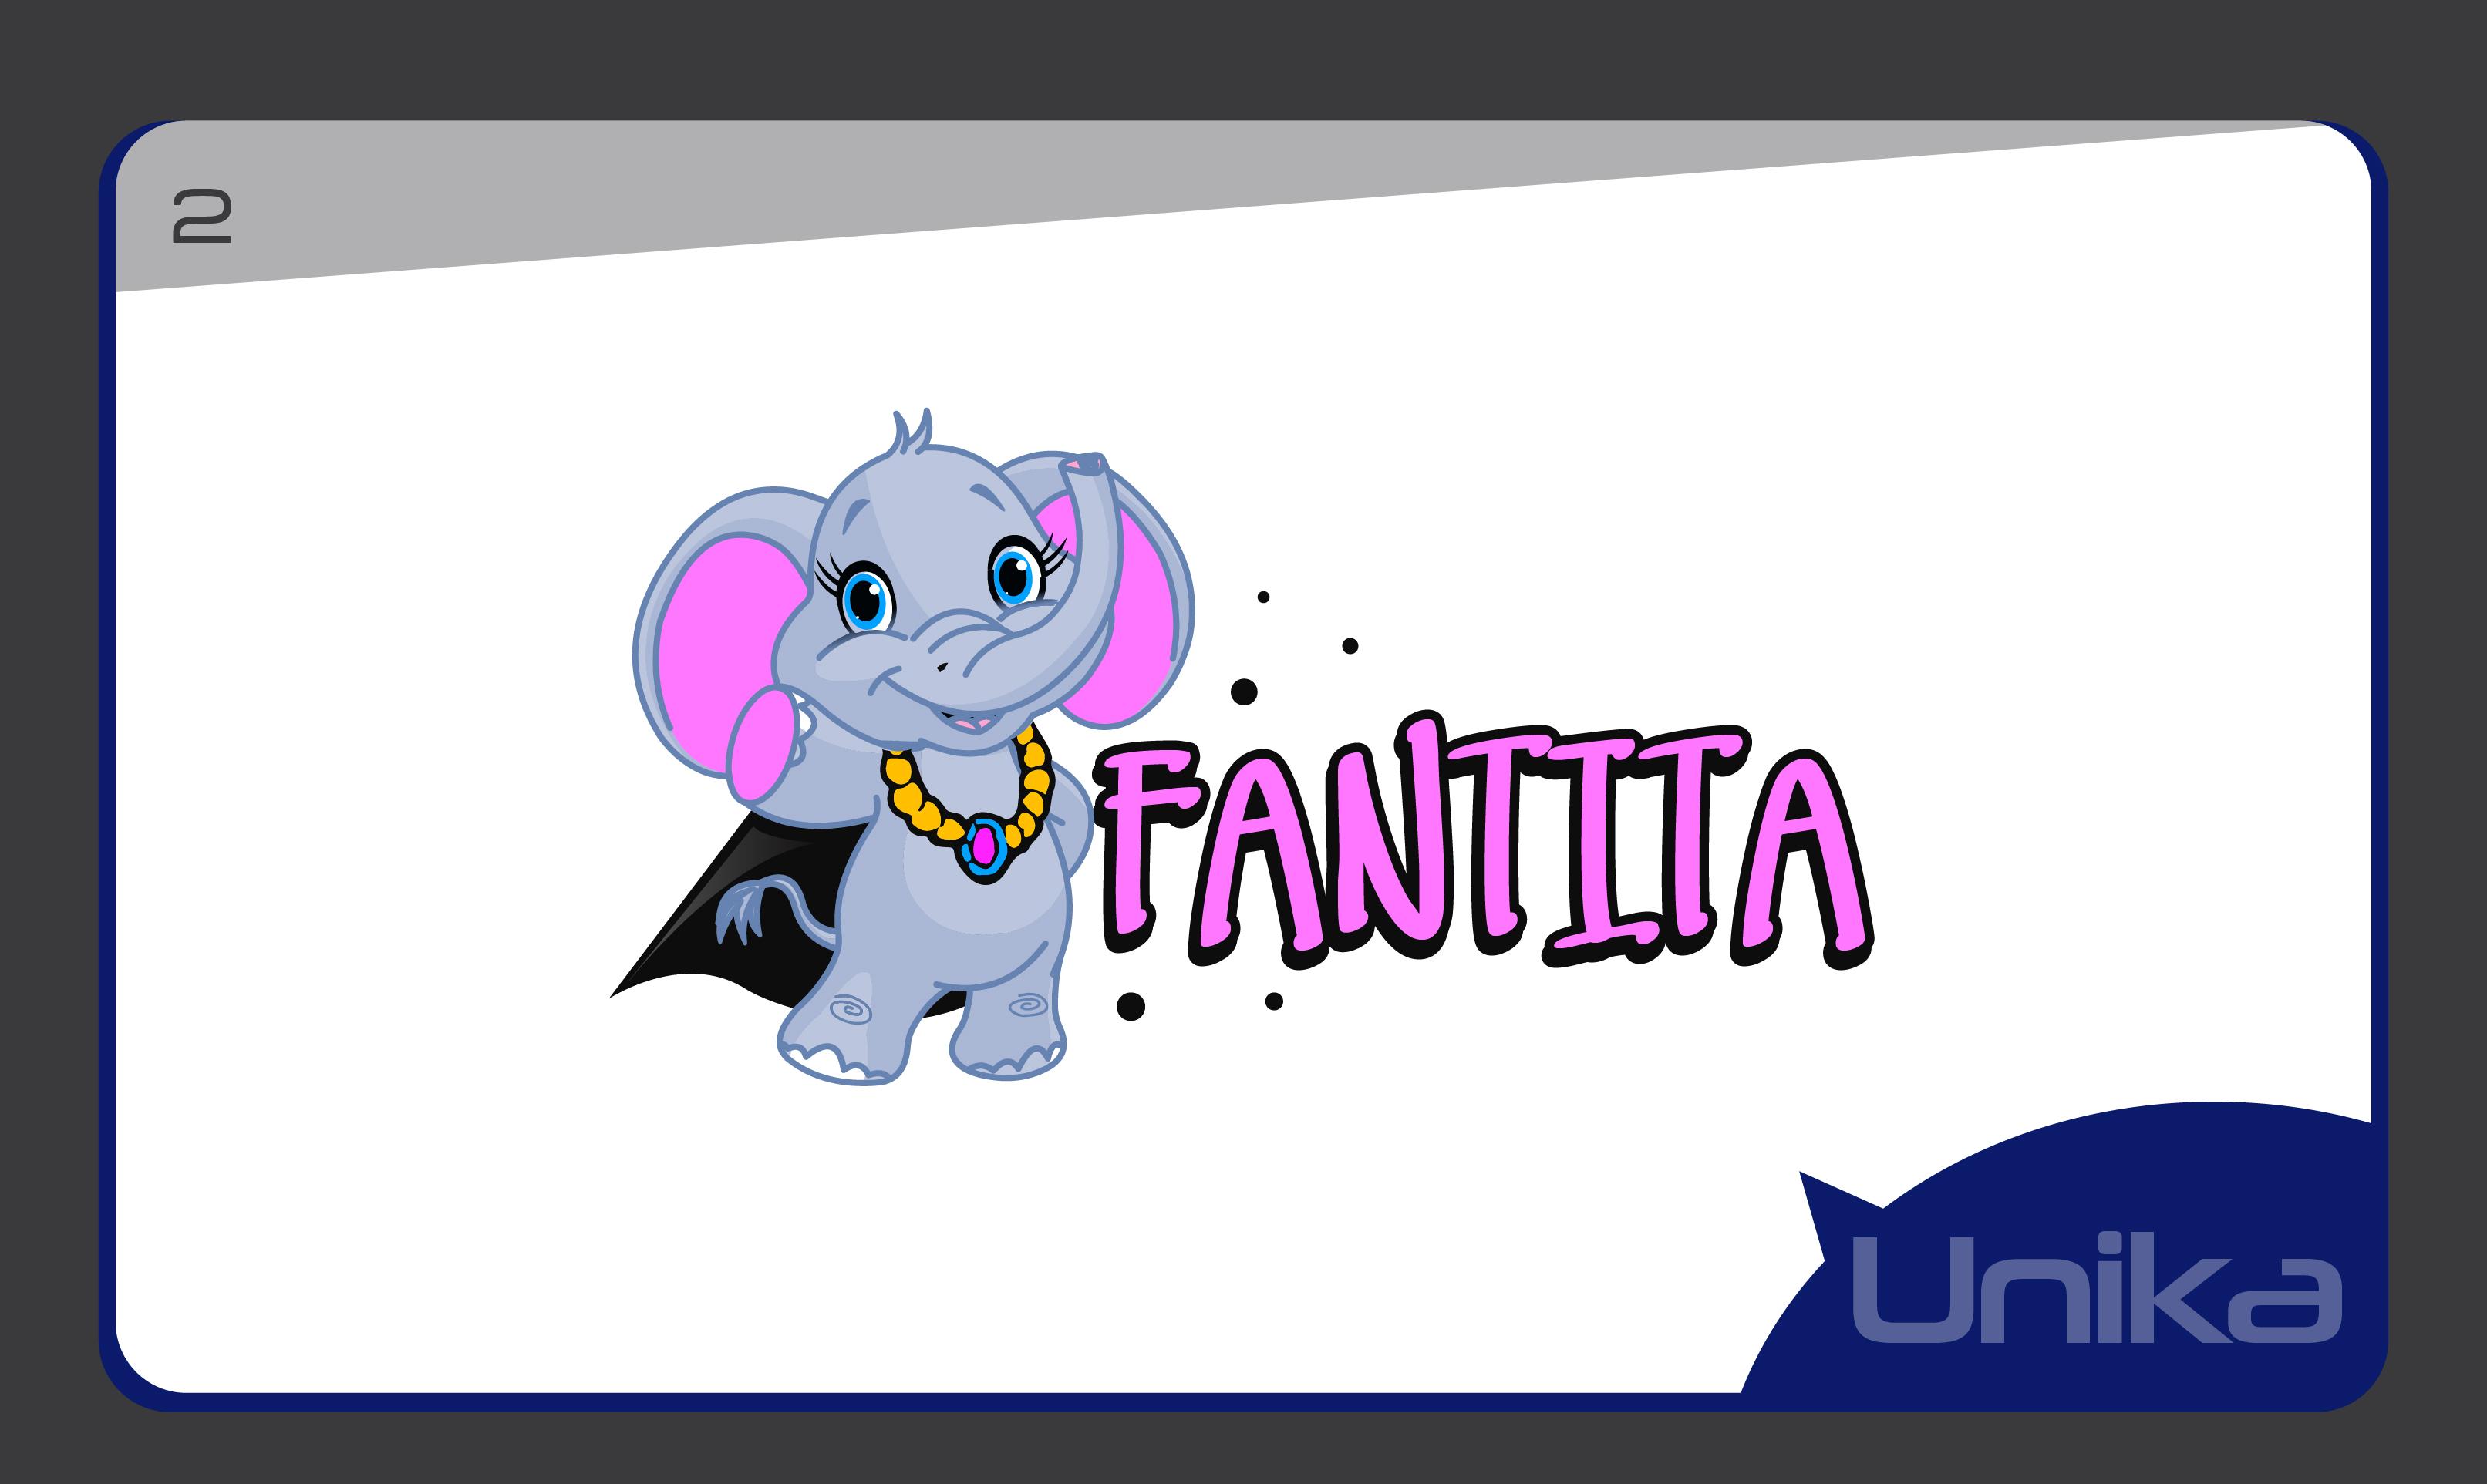 Elephant fantita